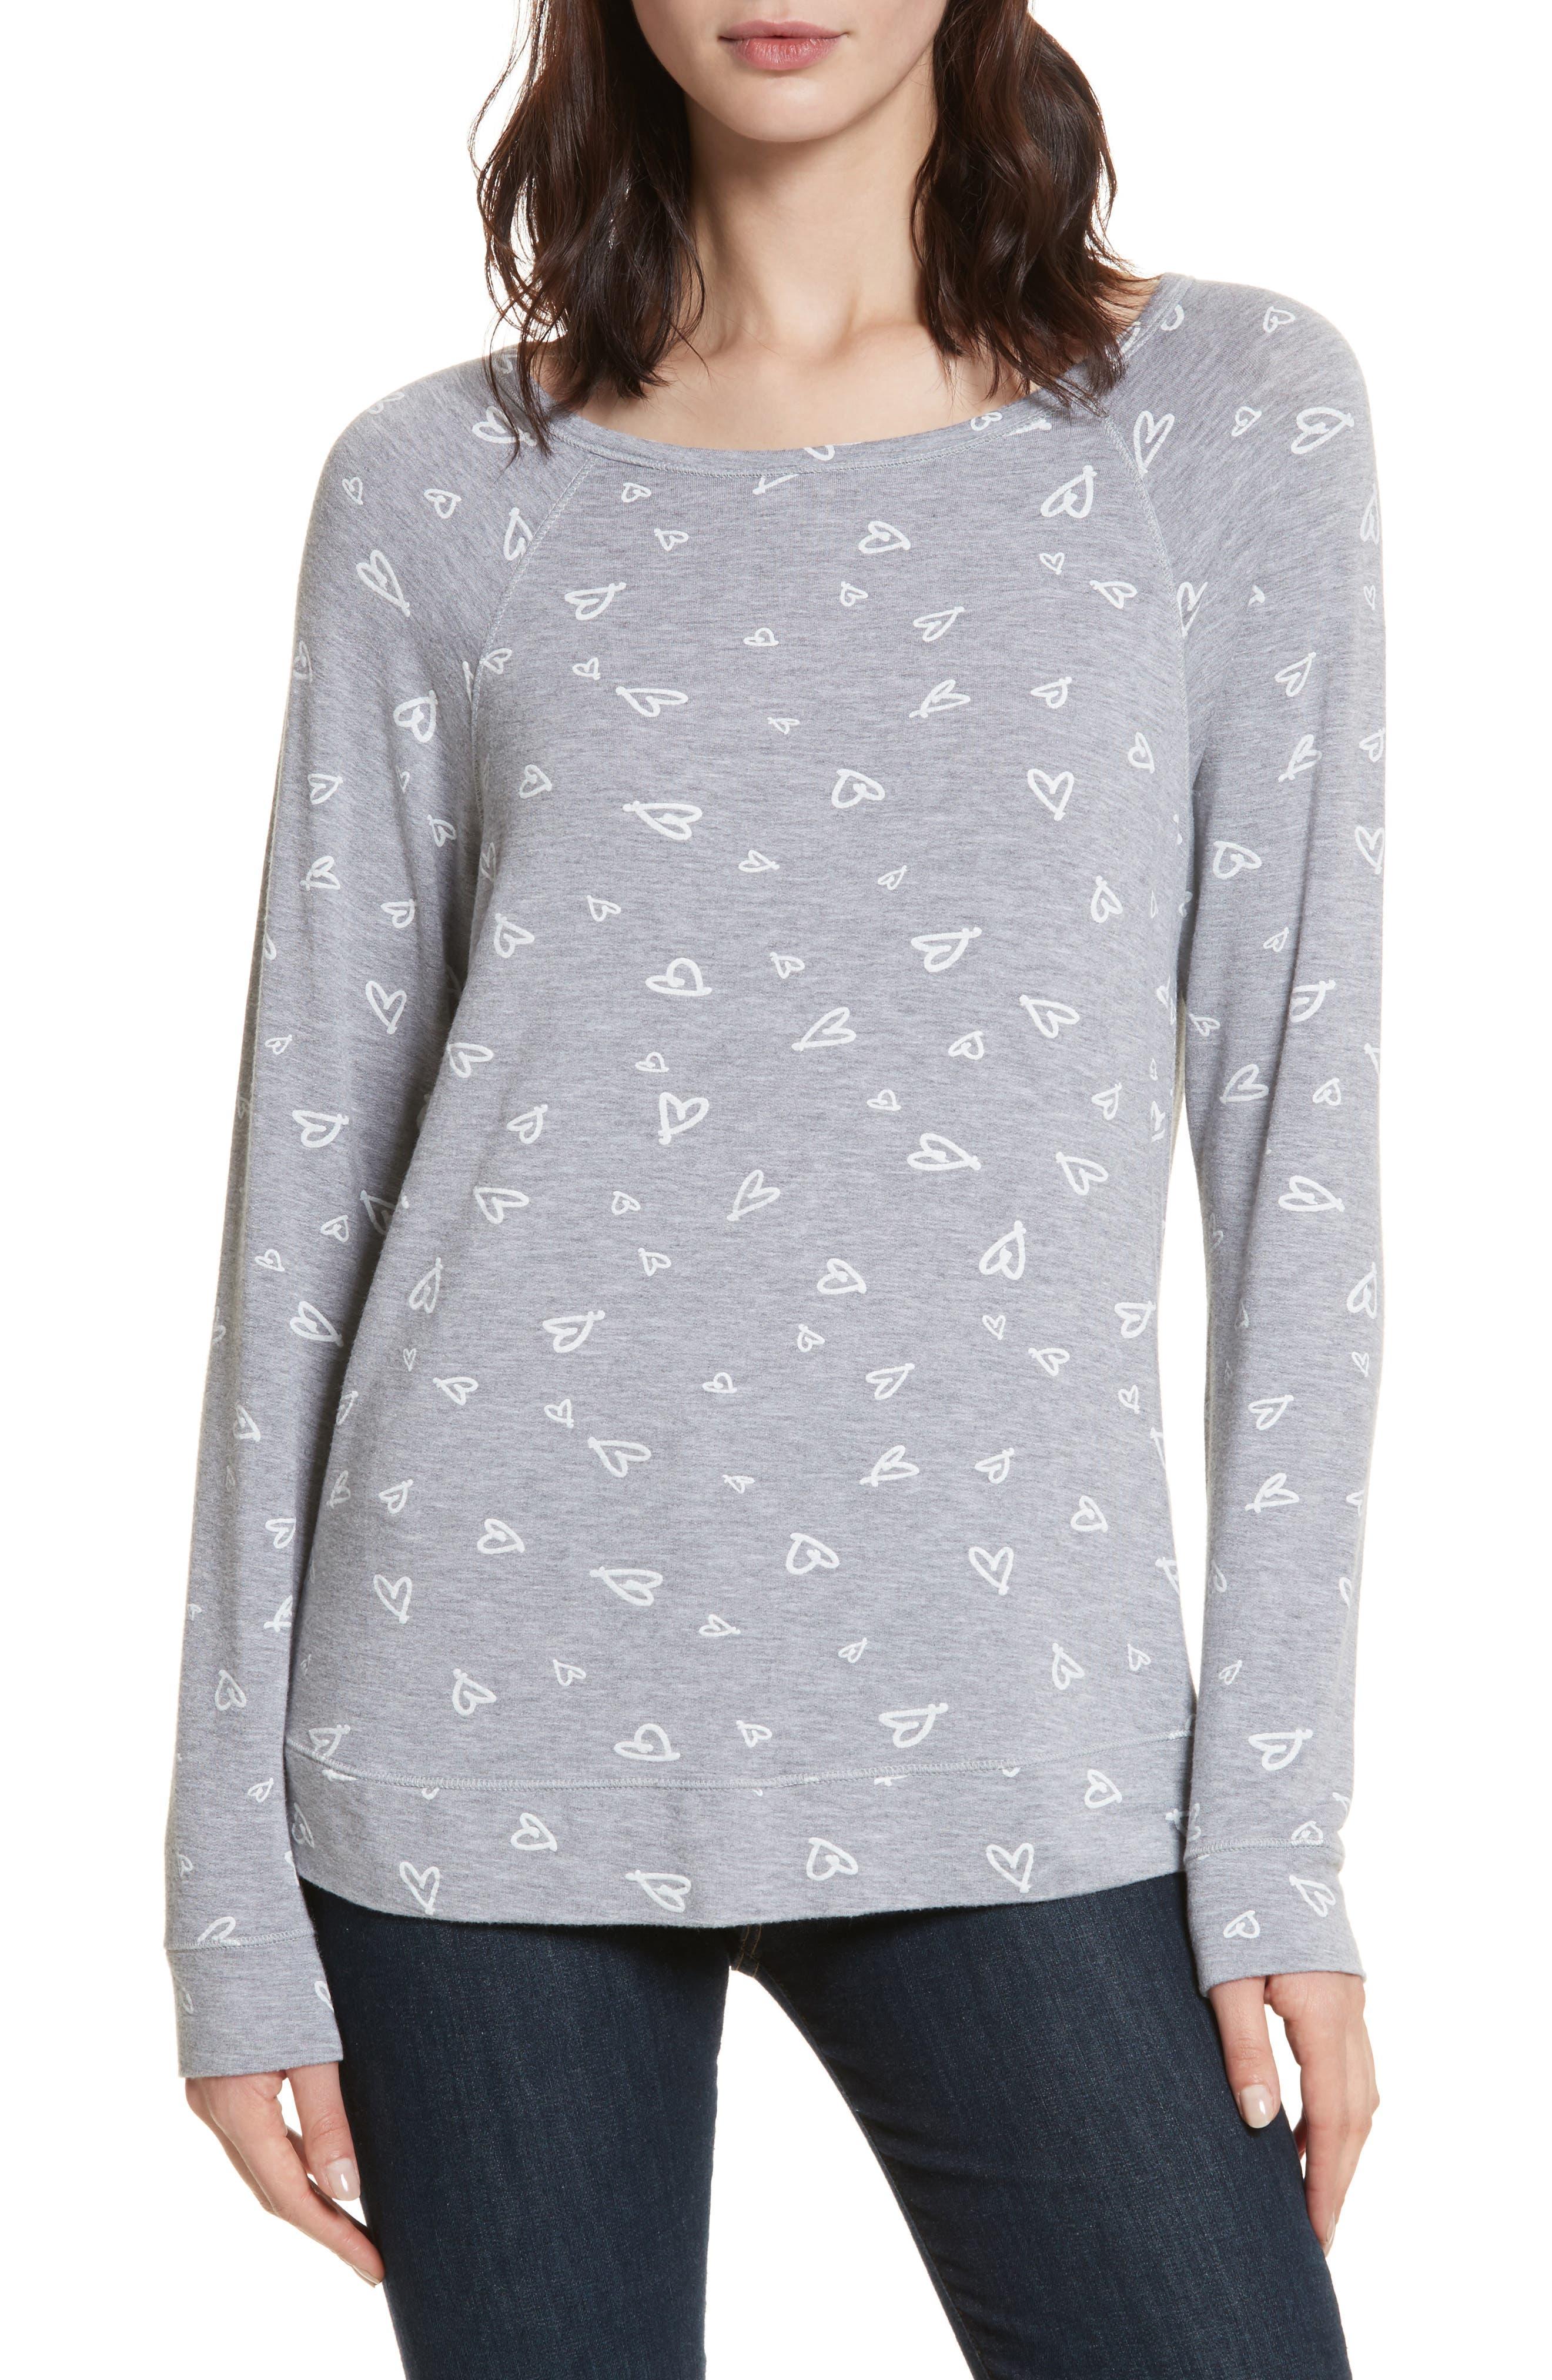 Annora B Print Cotton & Modal Blend Sweatshirt,                         Main,                         color, 071